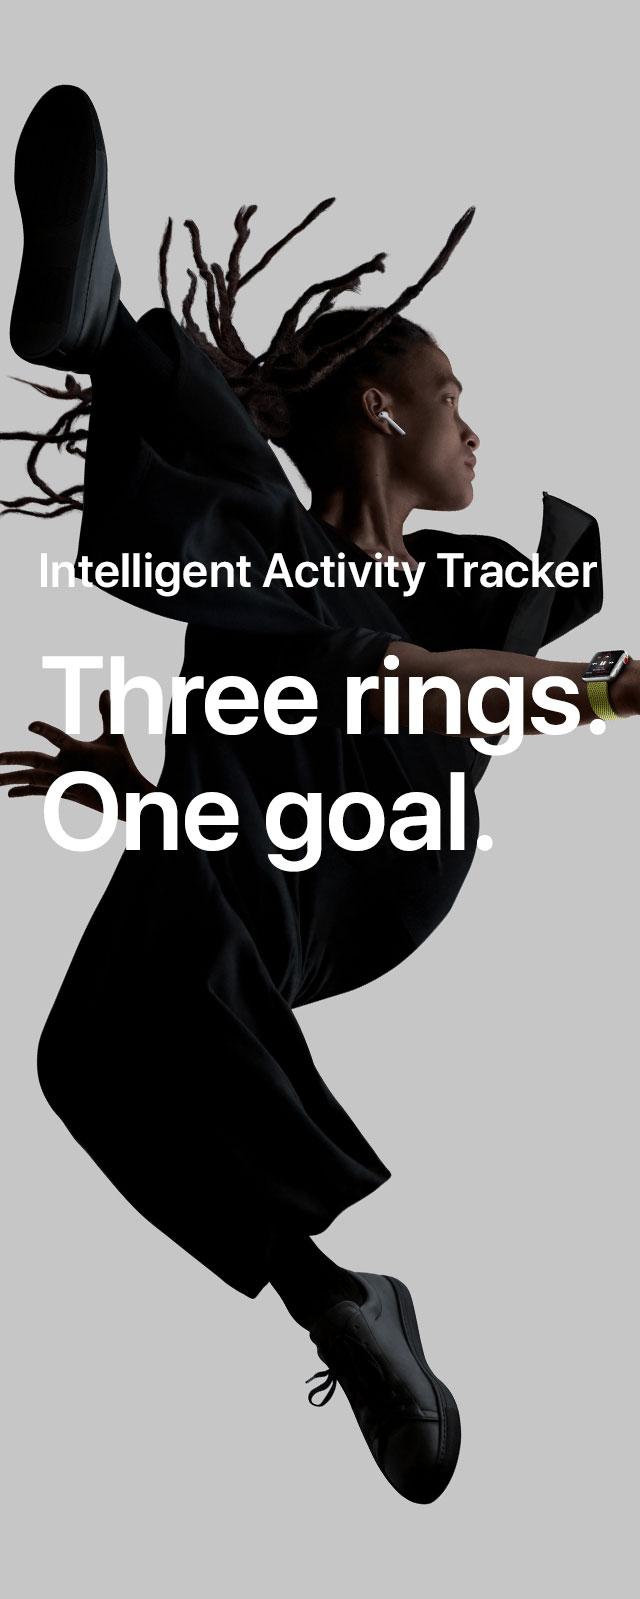 Intelligent activity tracker. Three rings. One goal.